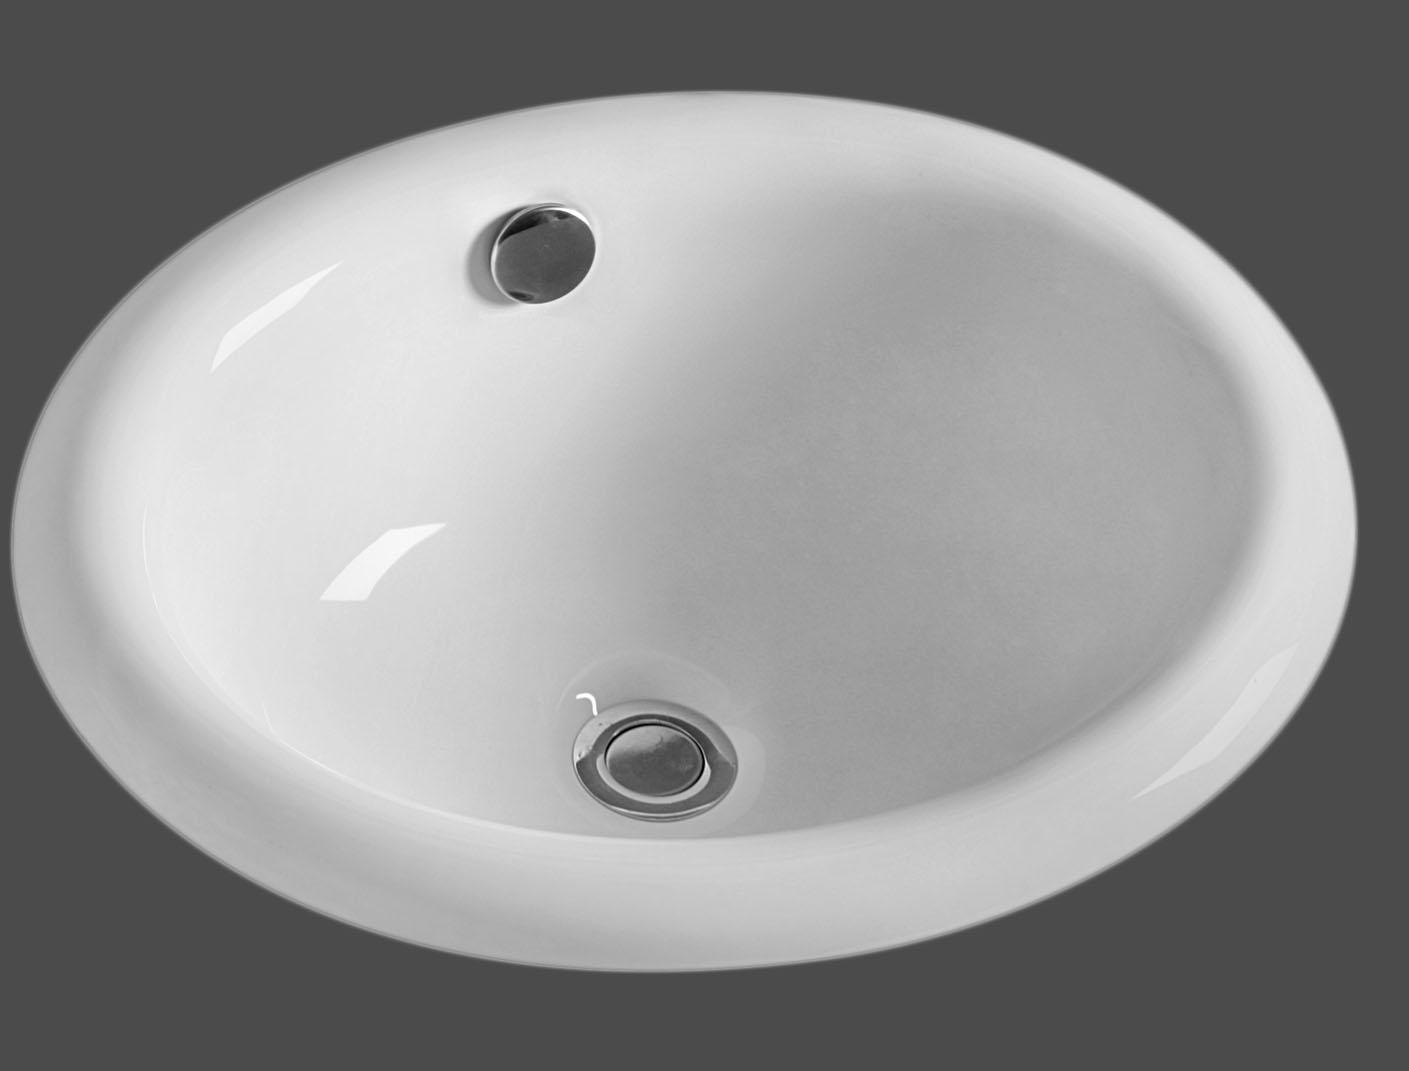 as230 18 3 x 15 x 7 3 topmount lavatory porcelain sink amerisink. Black Bedroom Furniture Sets. Home Design Ideas